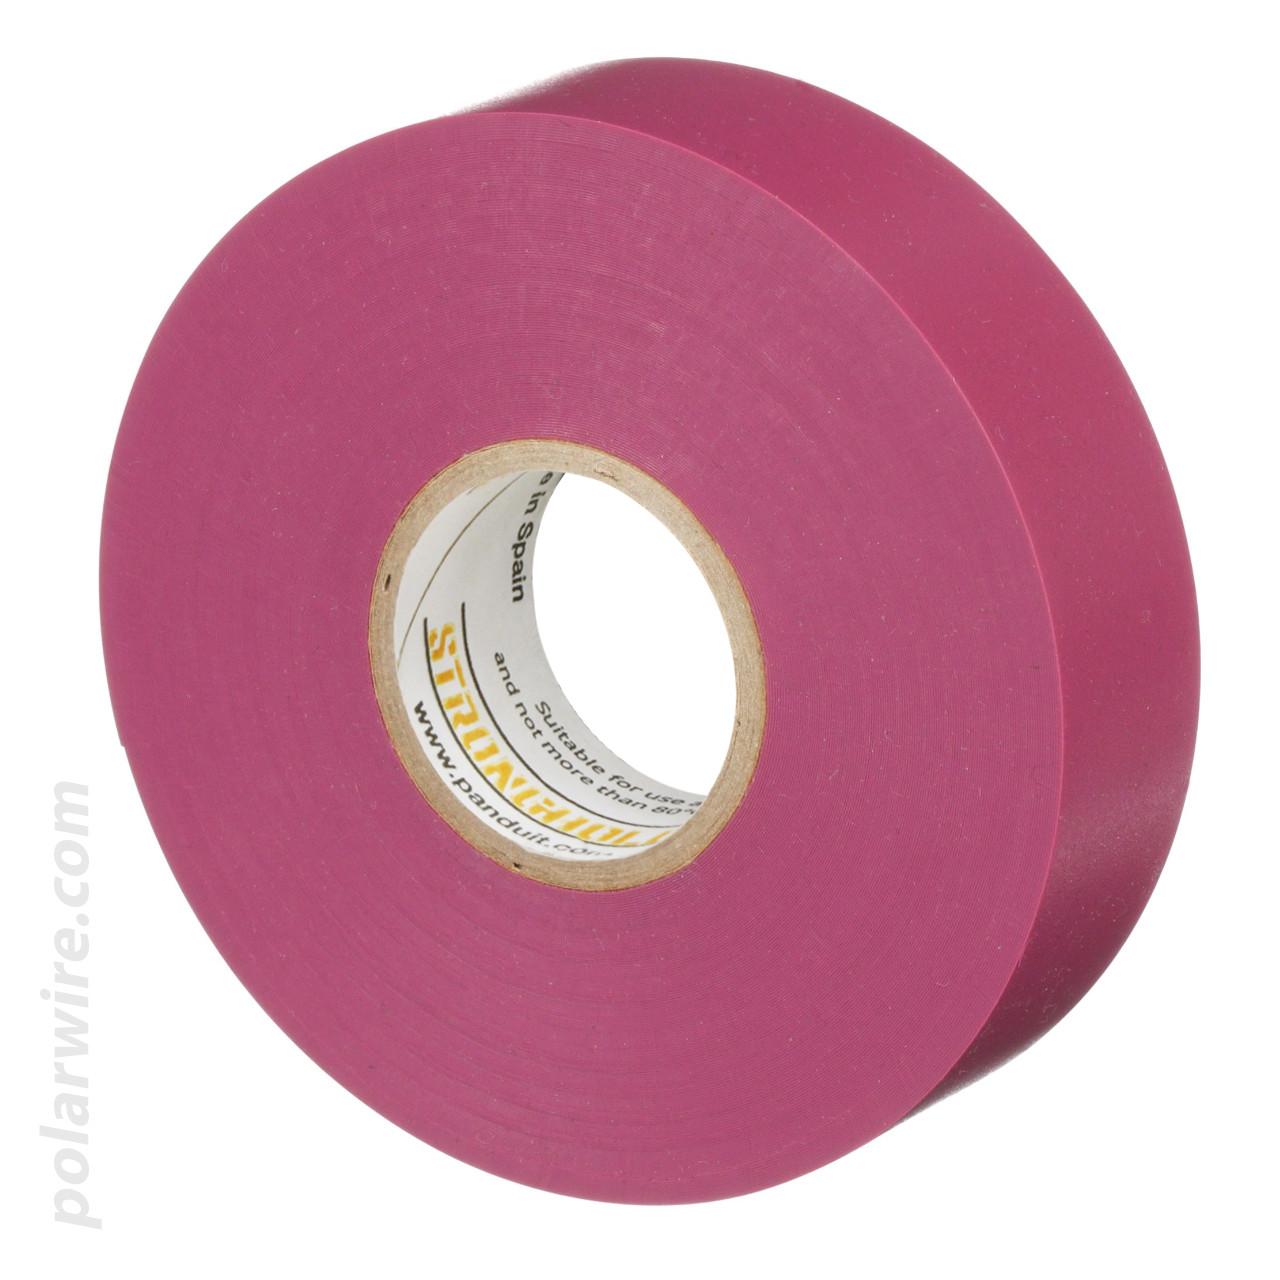 Panduit ST35-075-66VI Professional Grade Electrical Tape